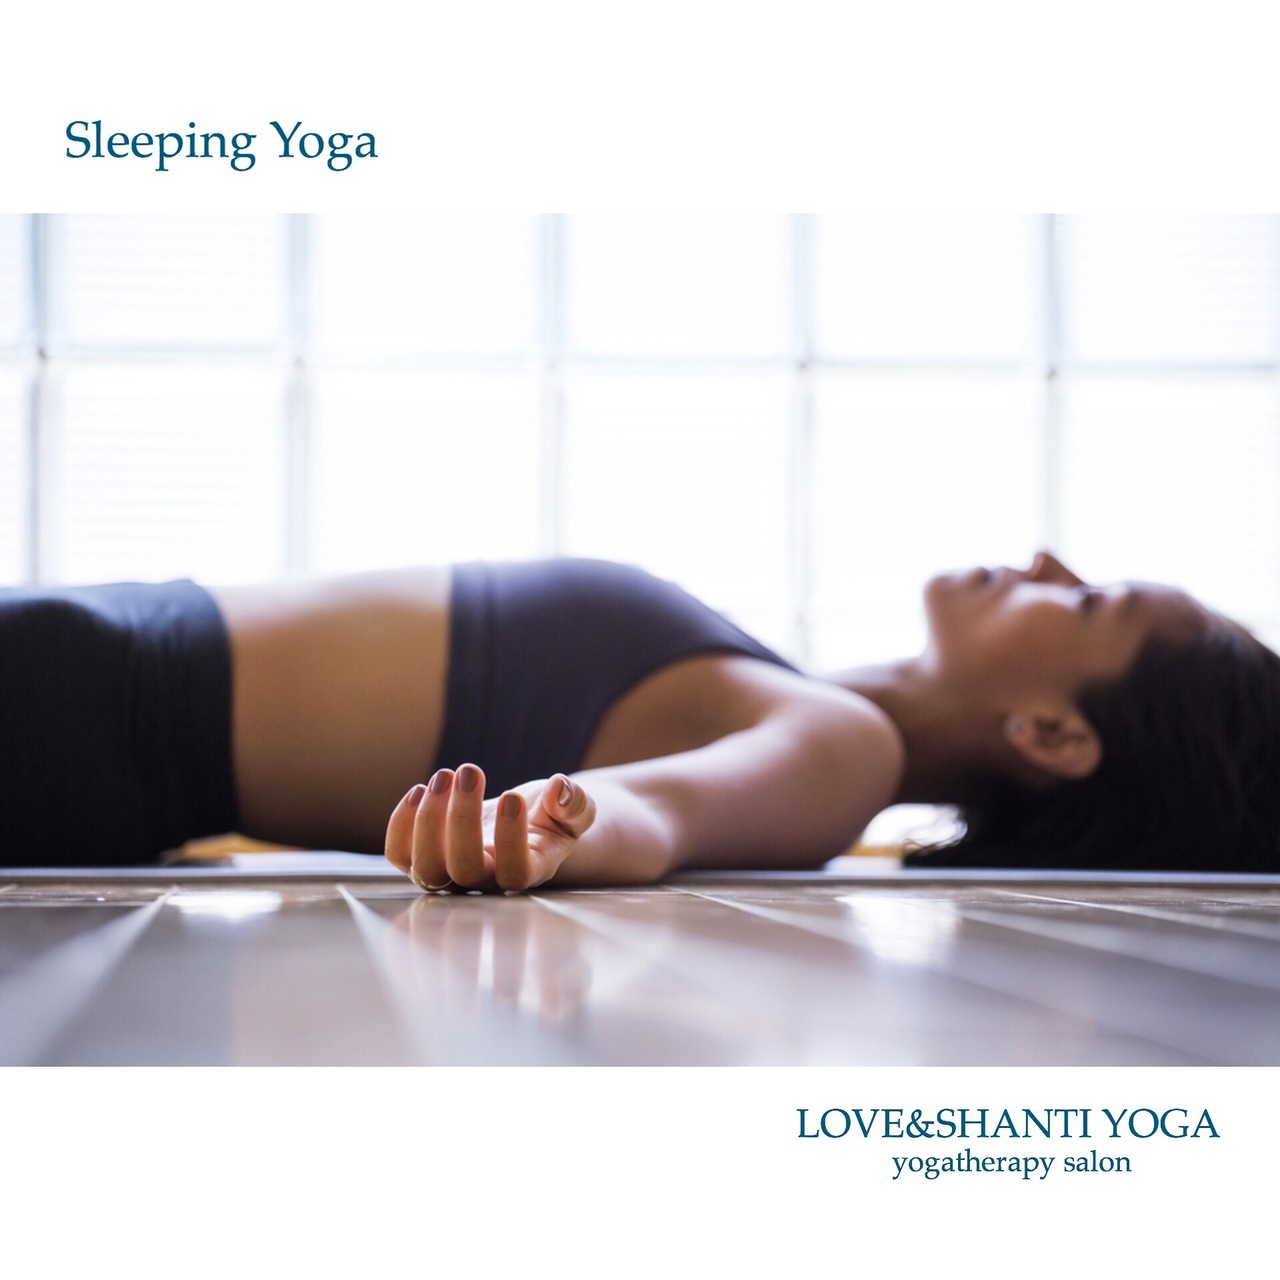 Sleeping Yoga(脳科学・量子力学的ヨーガニドラーパーソナルセッション)